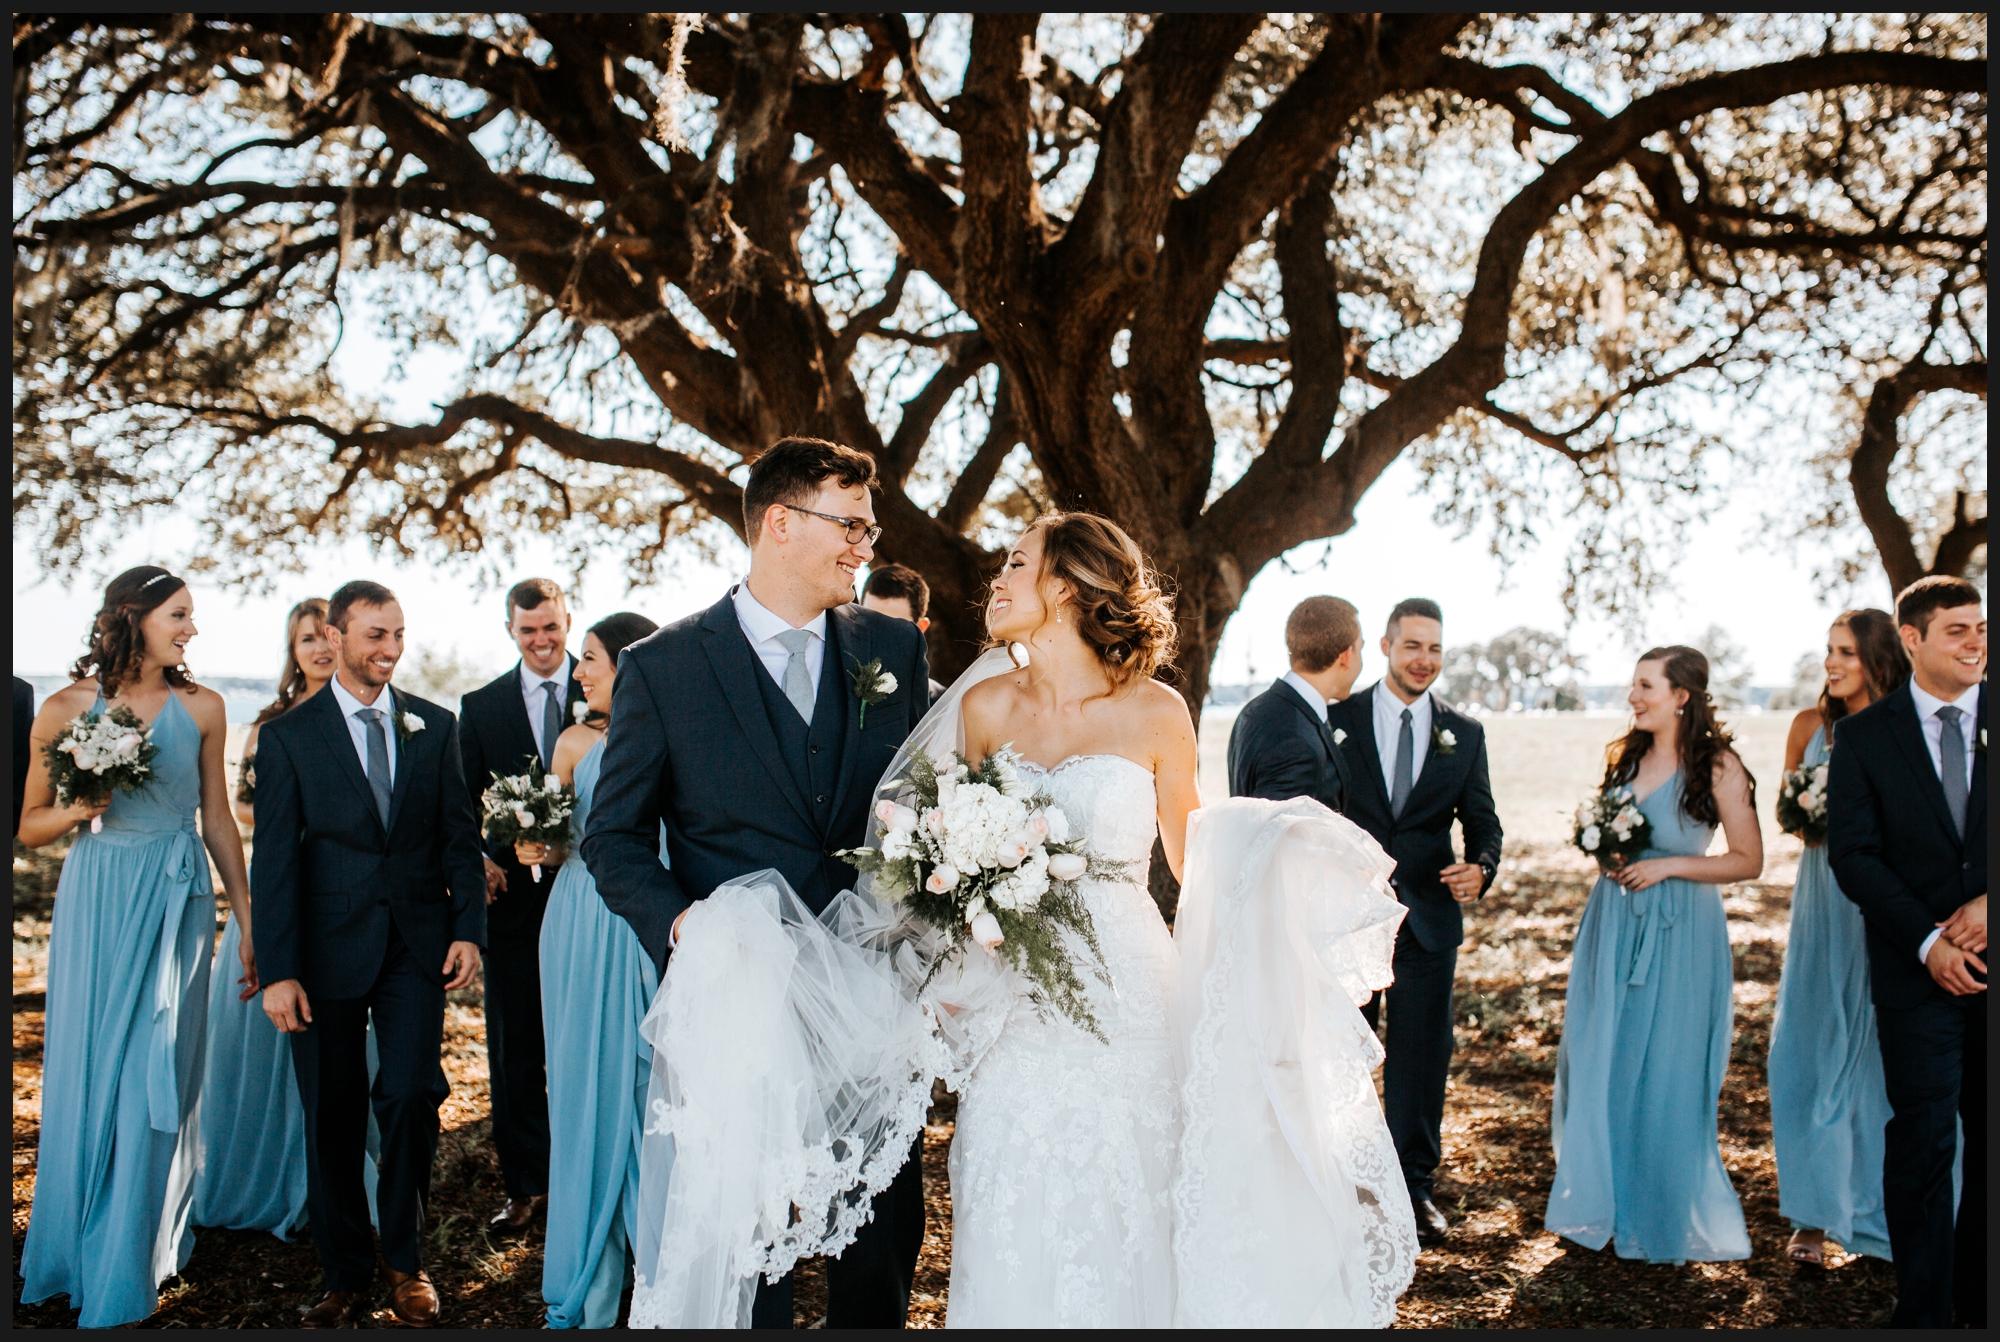 Orlando-Wedding-Photographer-destination-wedding-photographer-florida-wedding-photographer-bohemian-wedding-photographer_0078.jpg